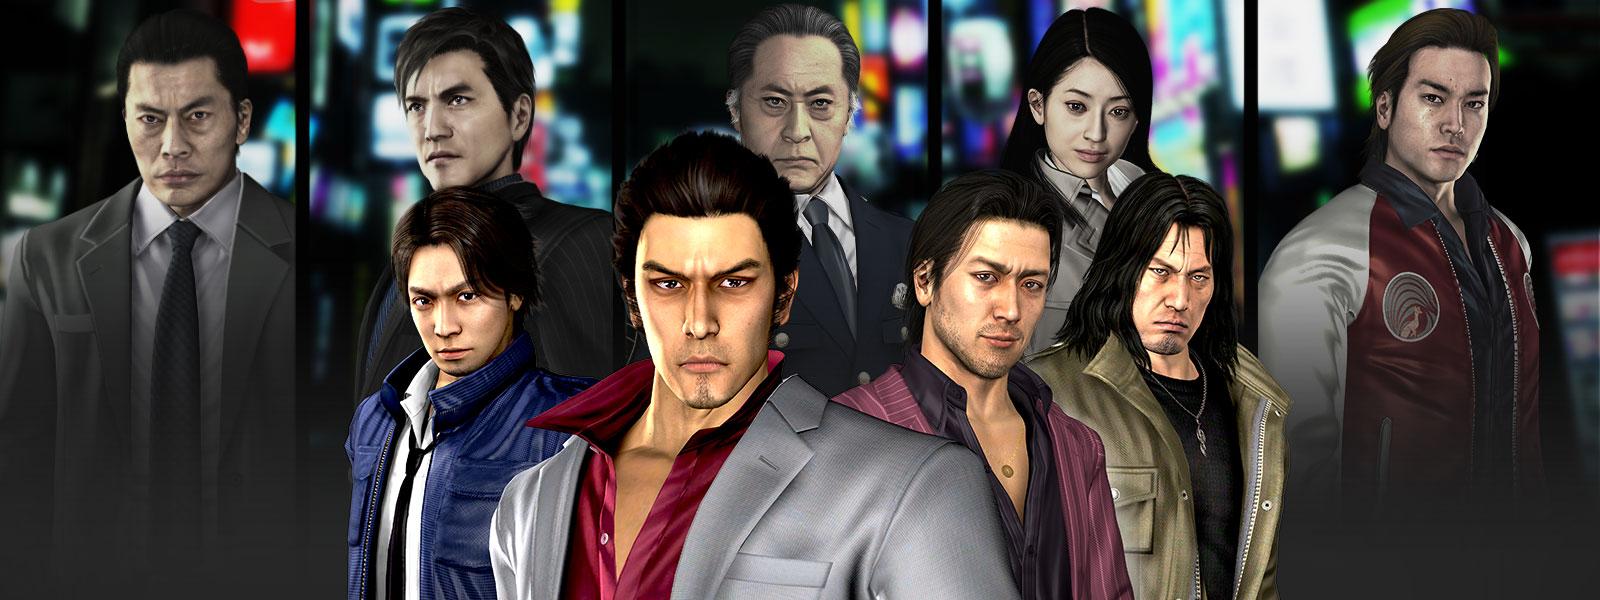 Kazuma Kiryu, Masayoshi Tanimura, Shun Akiyama und Taiga Saejima posieren vor einer Collage aus Yakuza-Charakteren